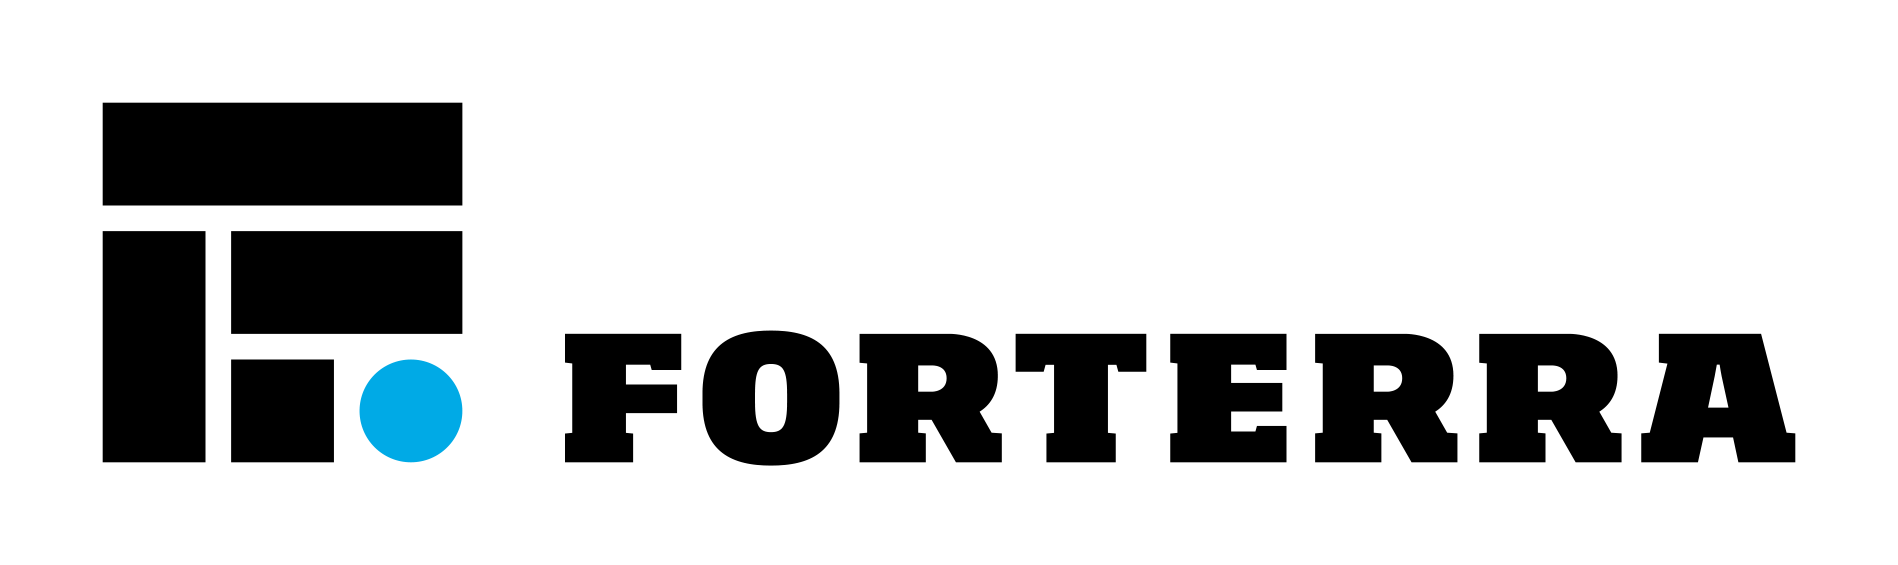 Forterra Pipe Logo.png